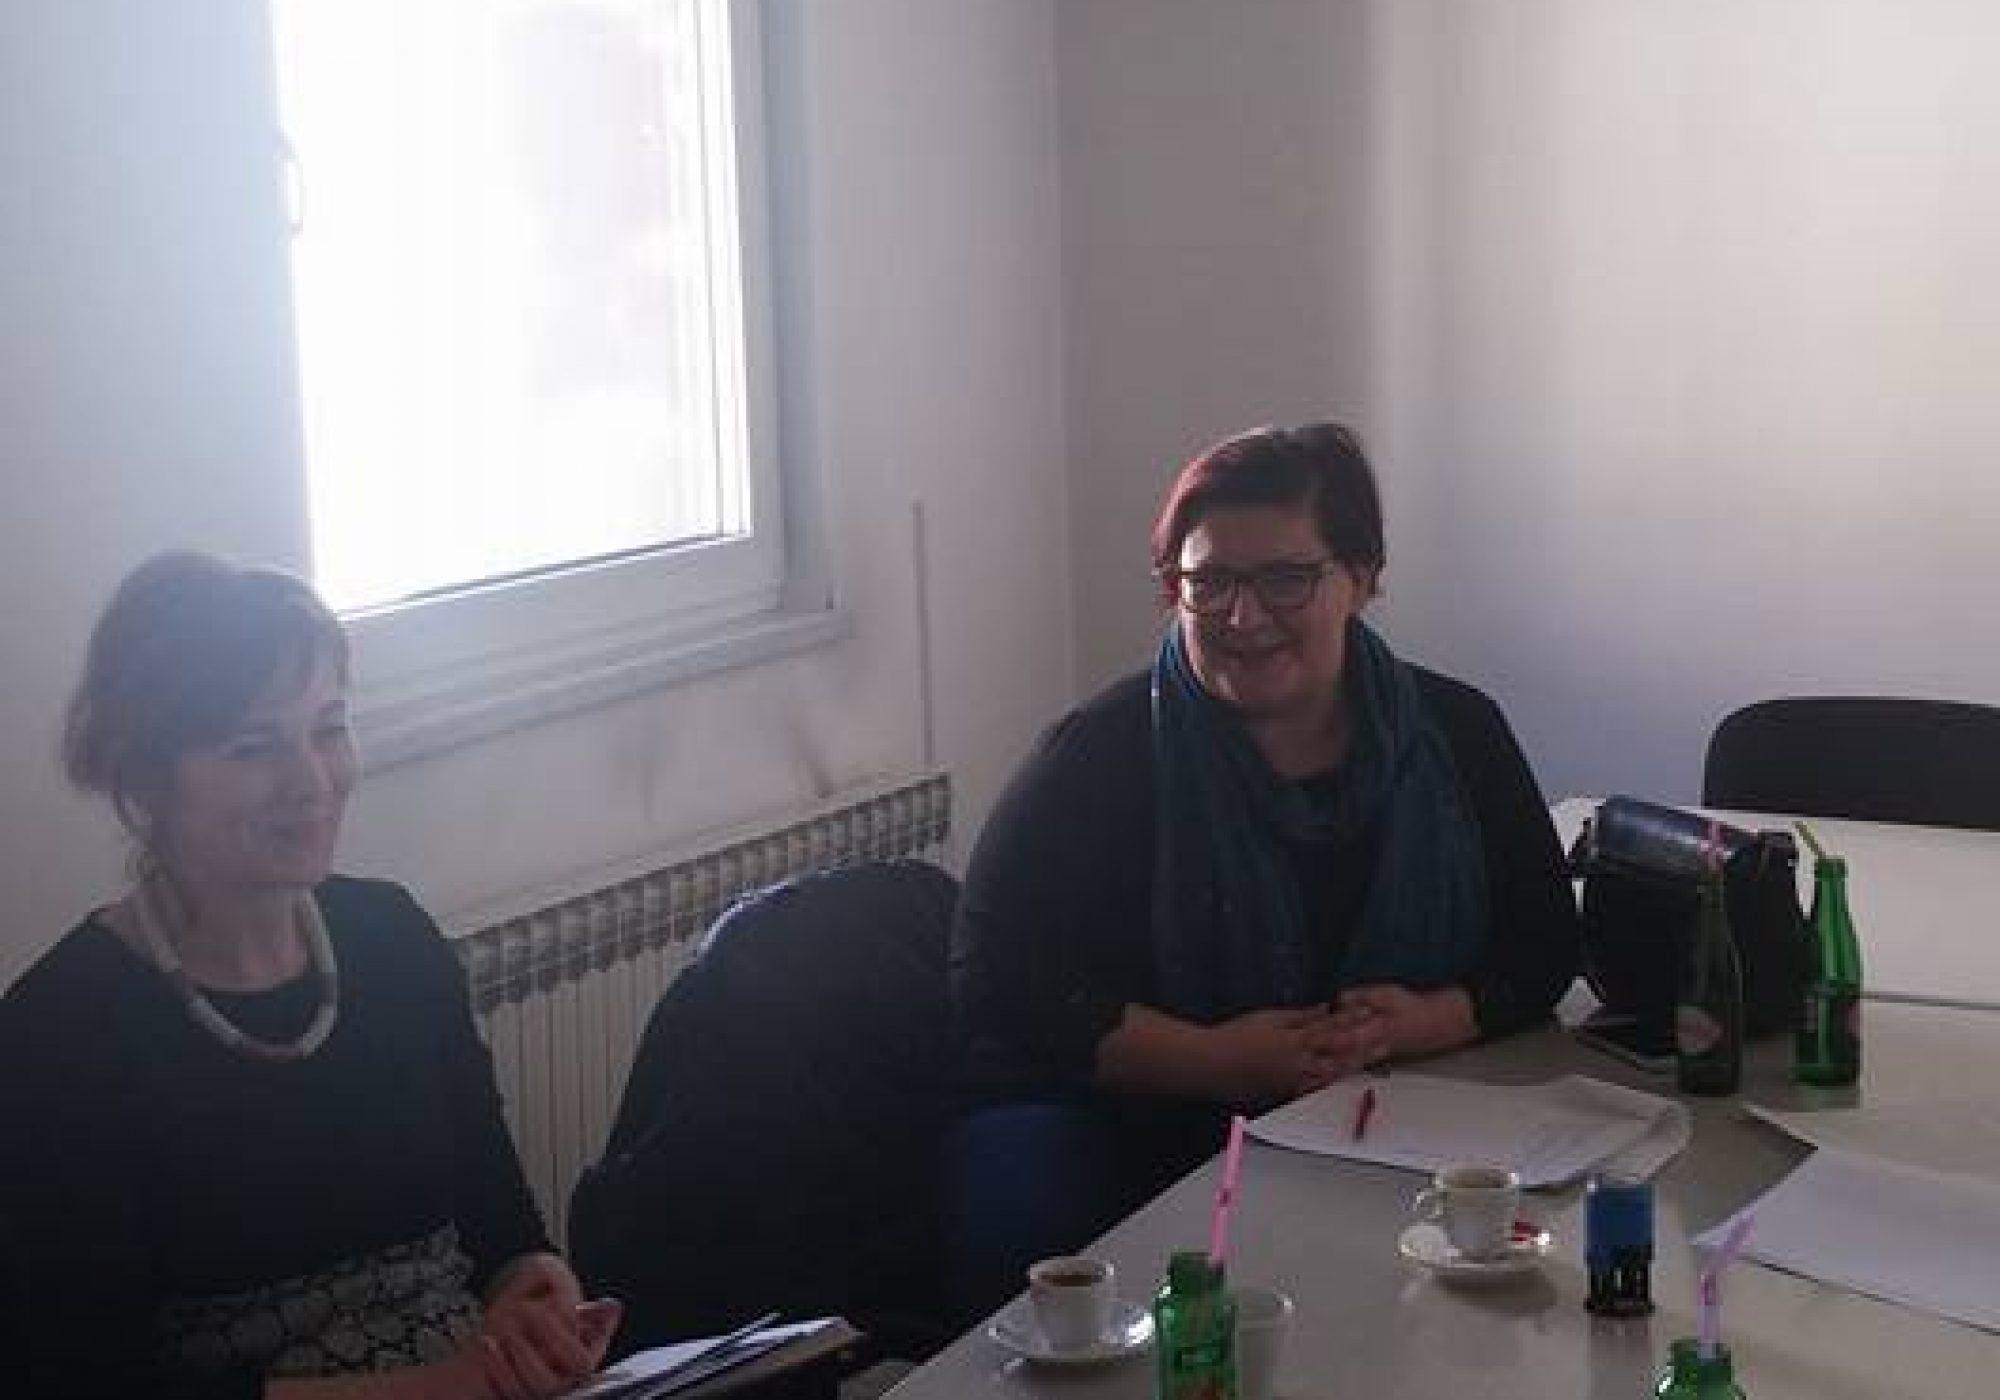 Održan sastanak članova udruženja/udruge socijalnih radnika SBK/KSB